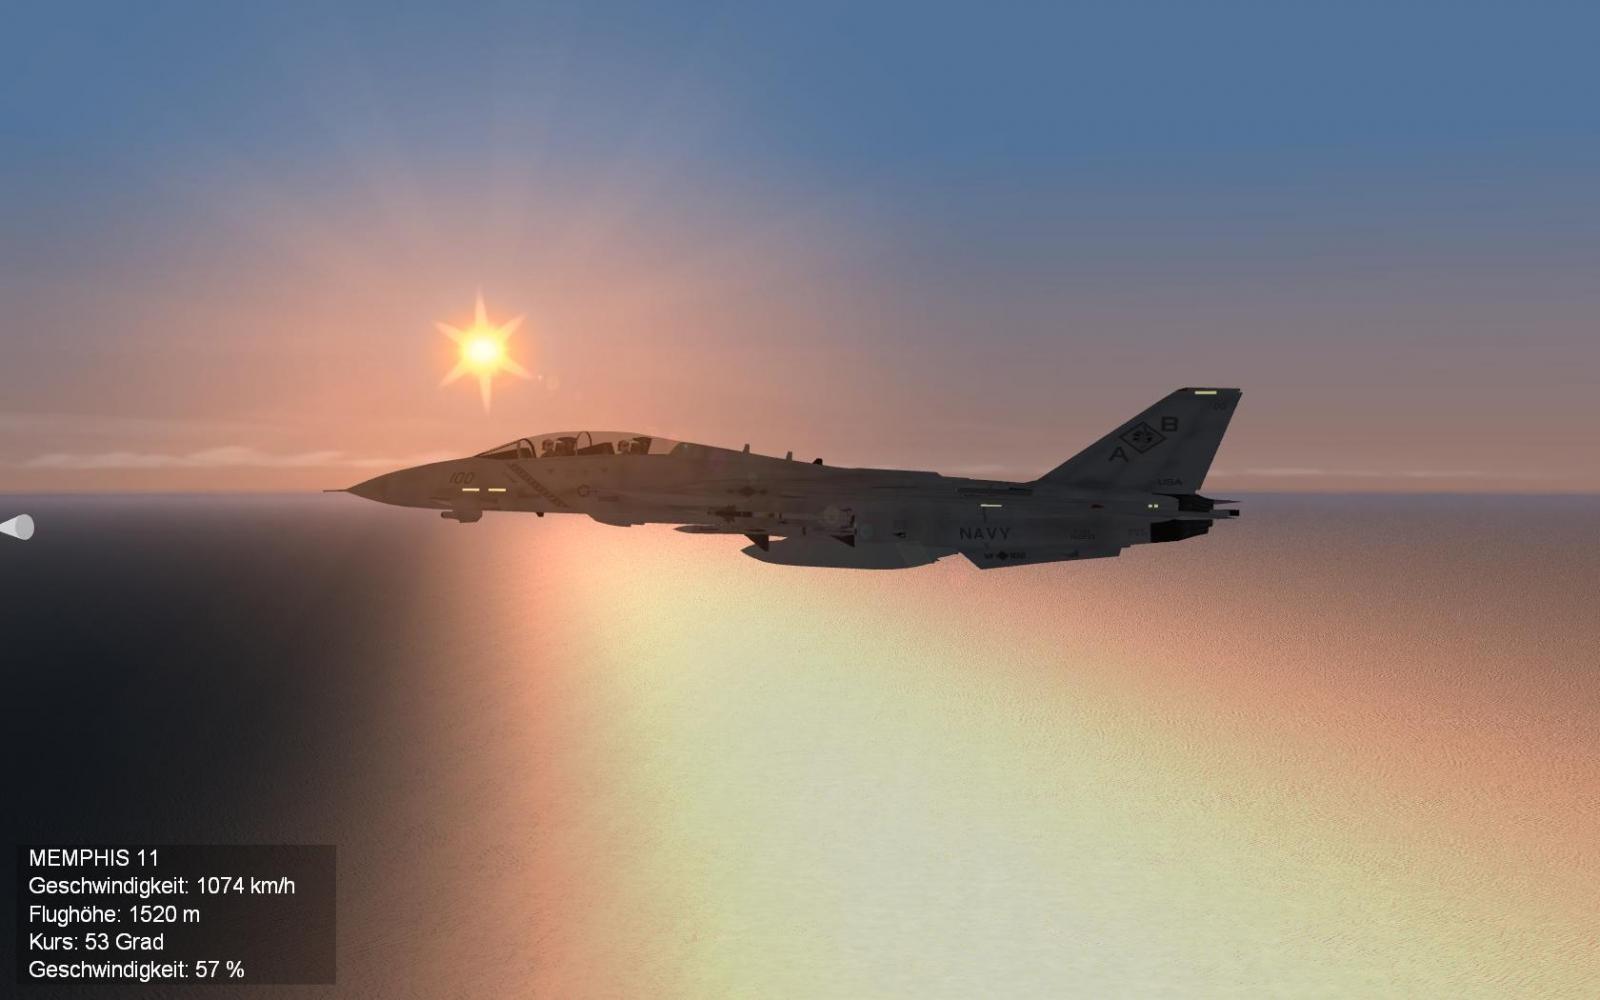 Tomcat dawn